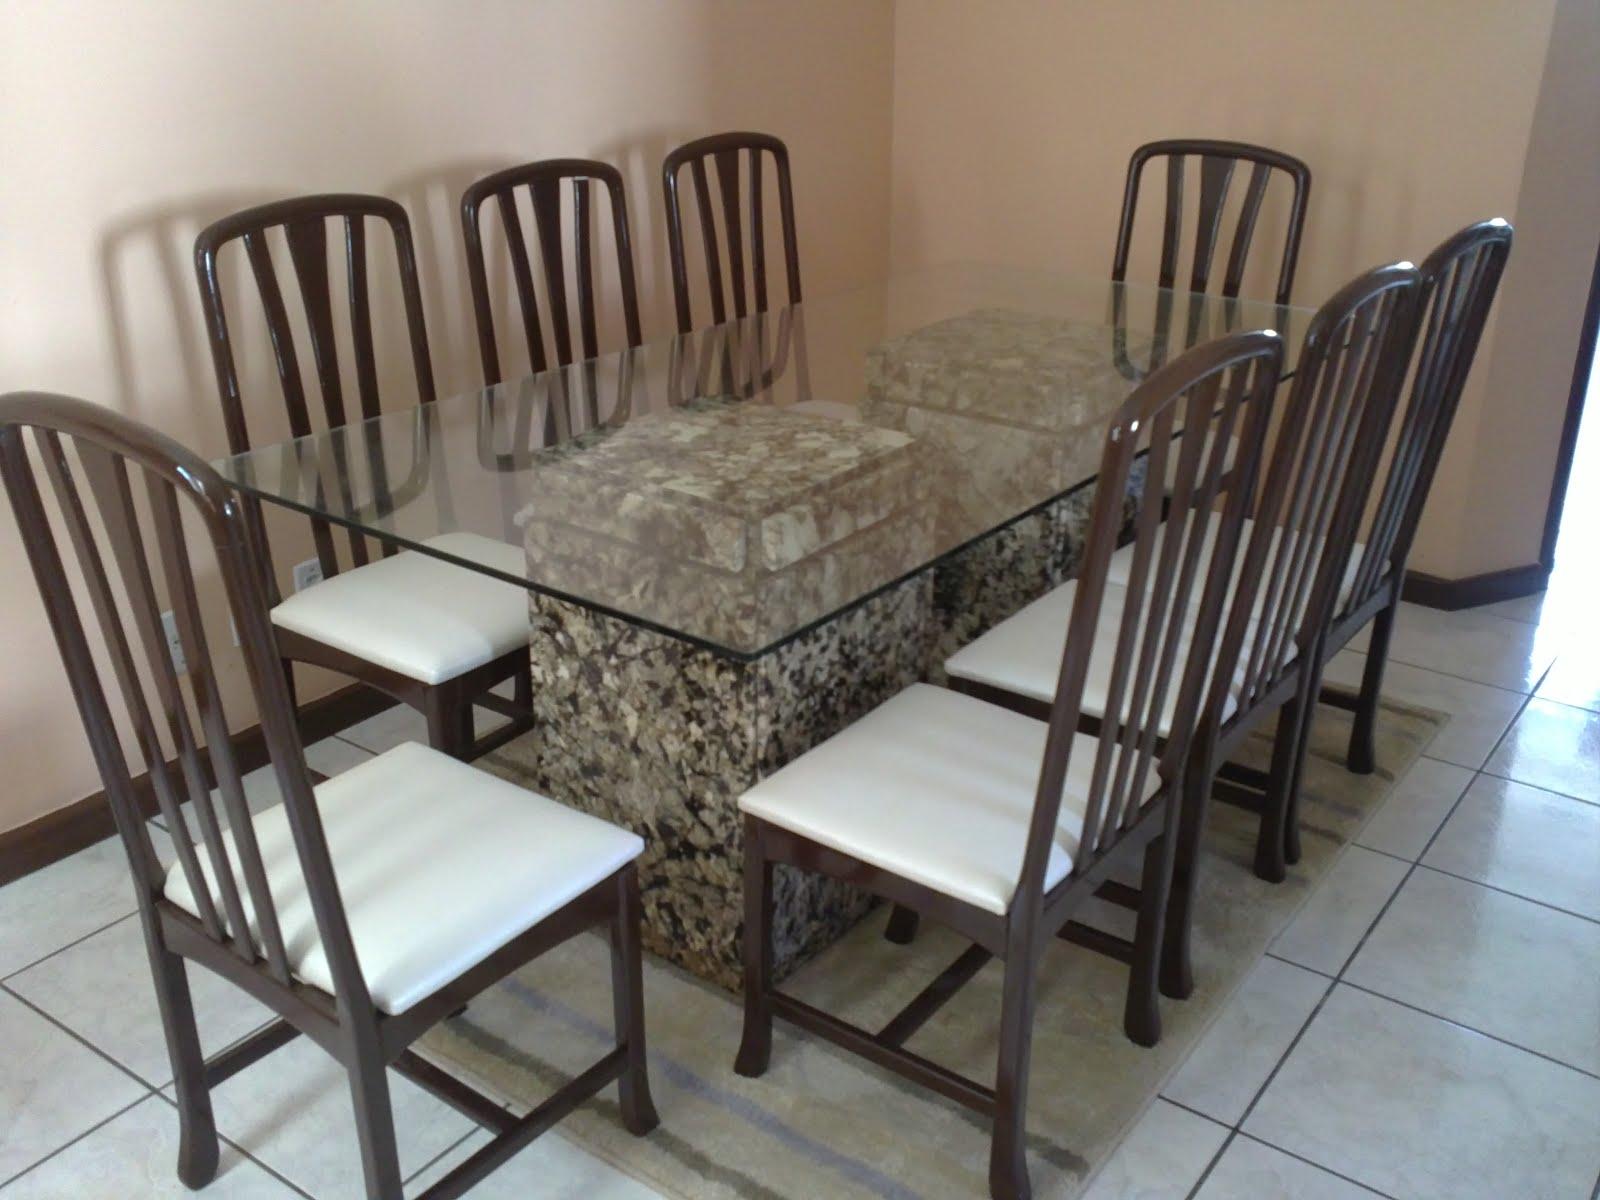 Mesa De Marmore Na Parede Casacor Braslia Cenrio Do Bon Vivant U  -> Sala De Jantar Pequena Com Mesa De Marmore